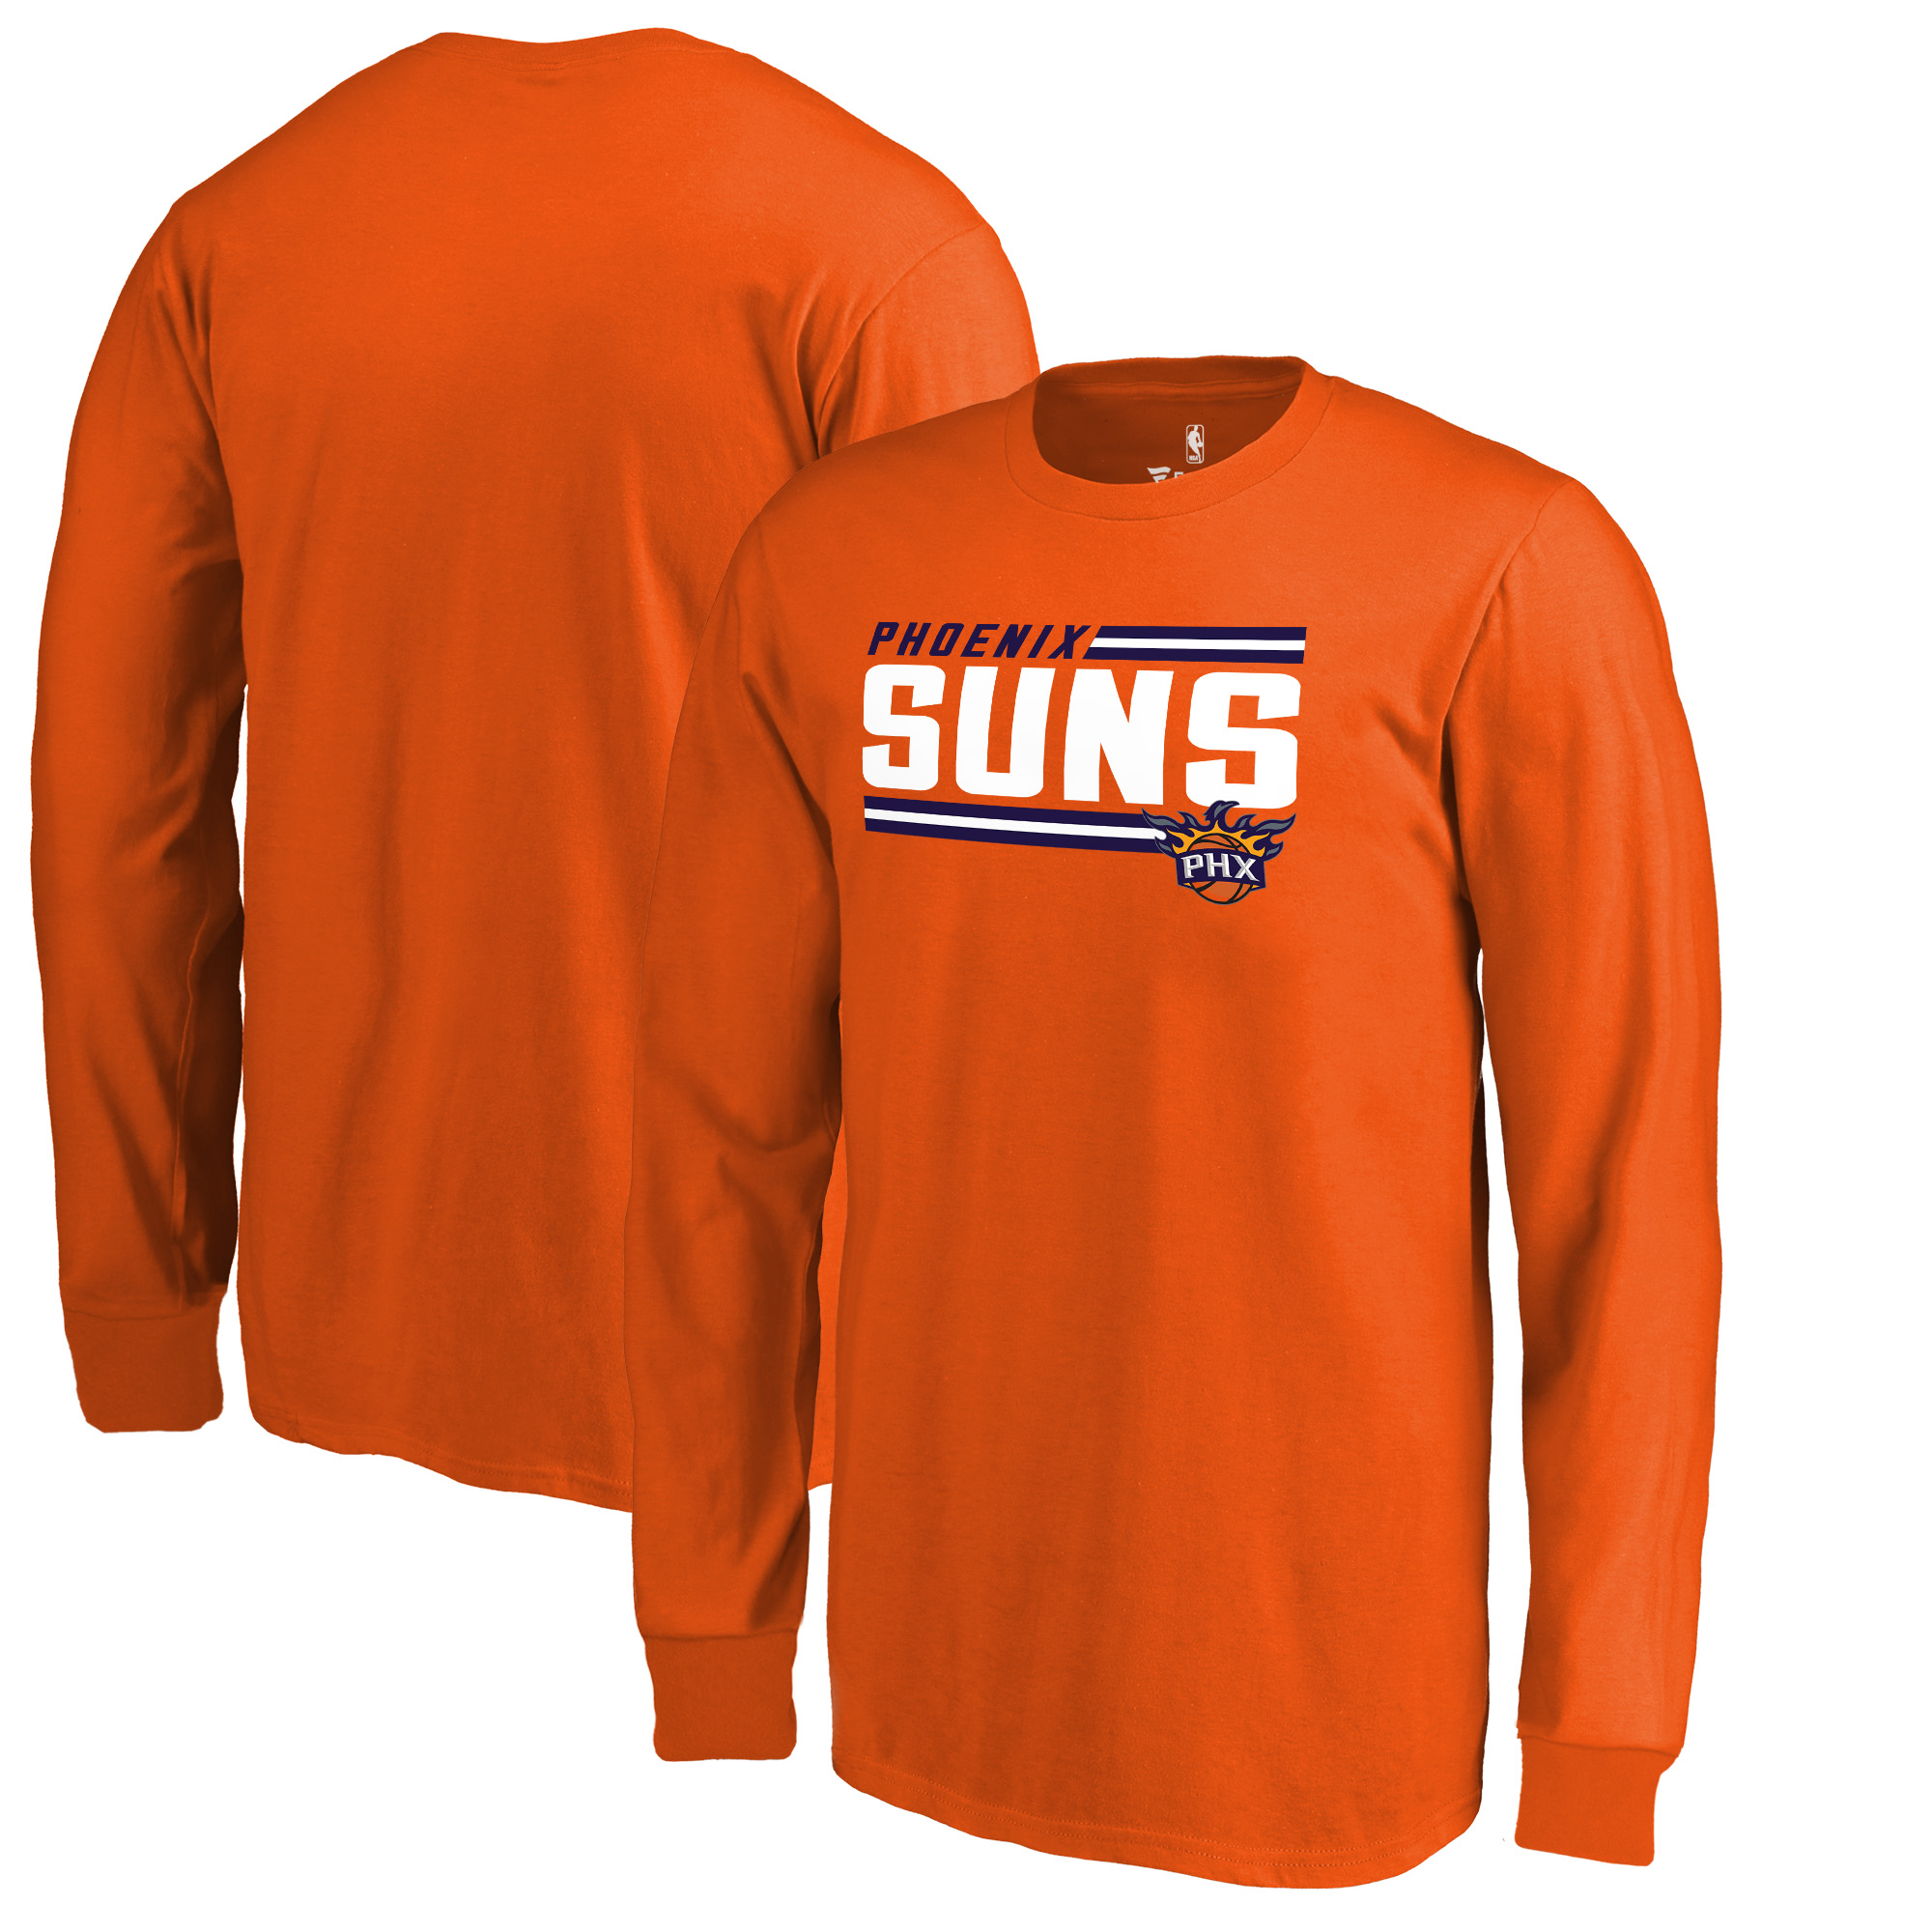 Phoenix Suns Fanatics Branded Youth Onside Stripe Long Sleeve T-Shirt - Orange